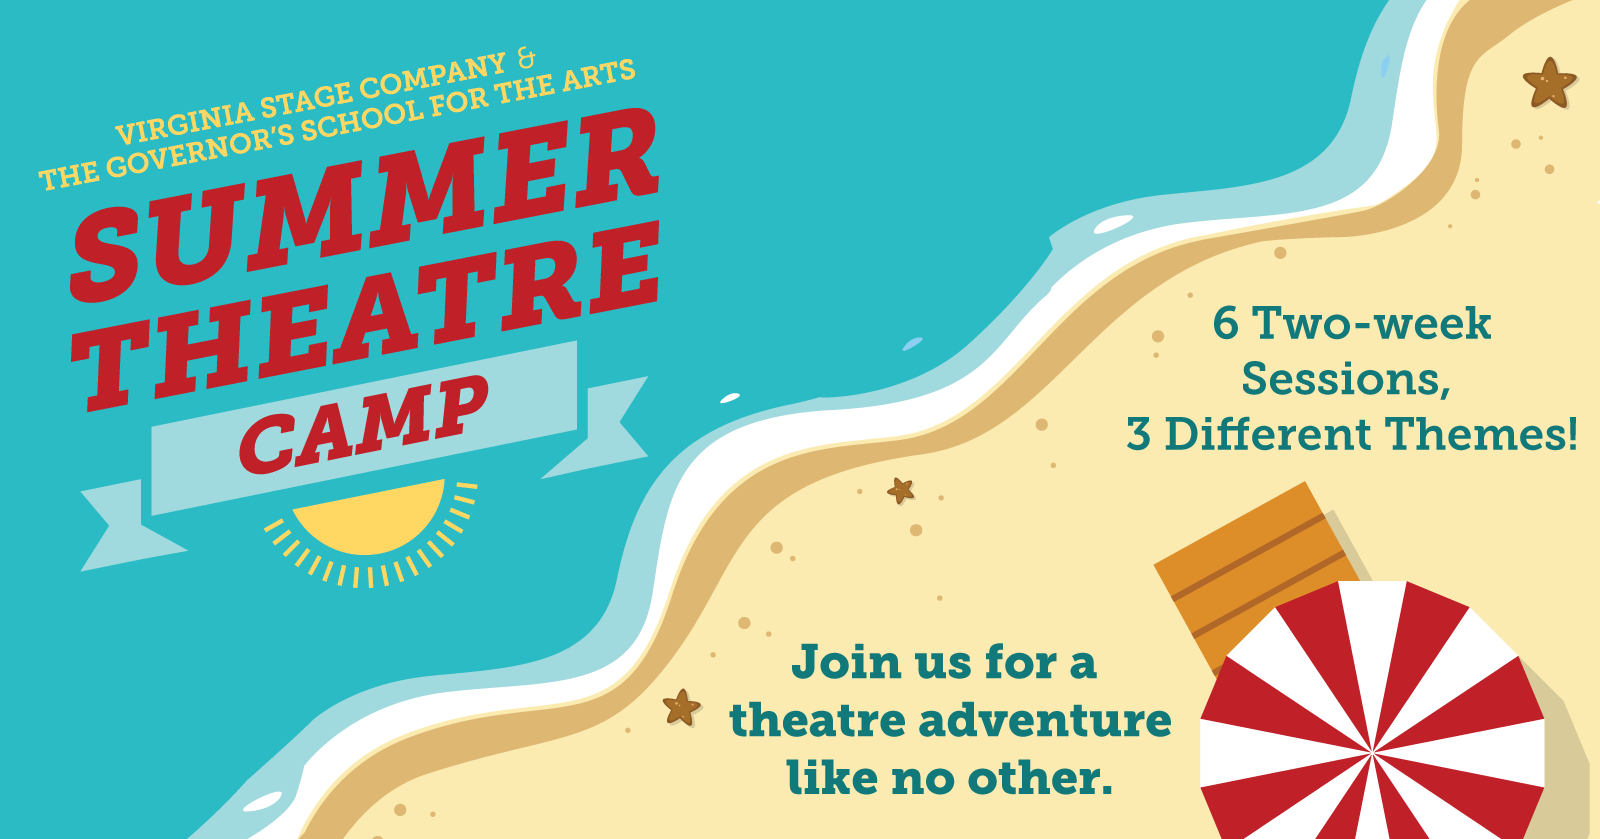 summercamp_header1600x839.png